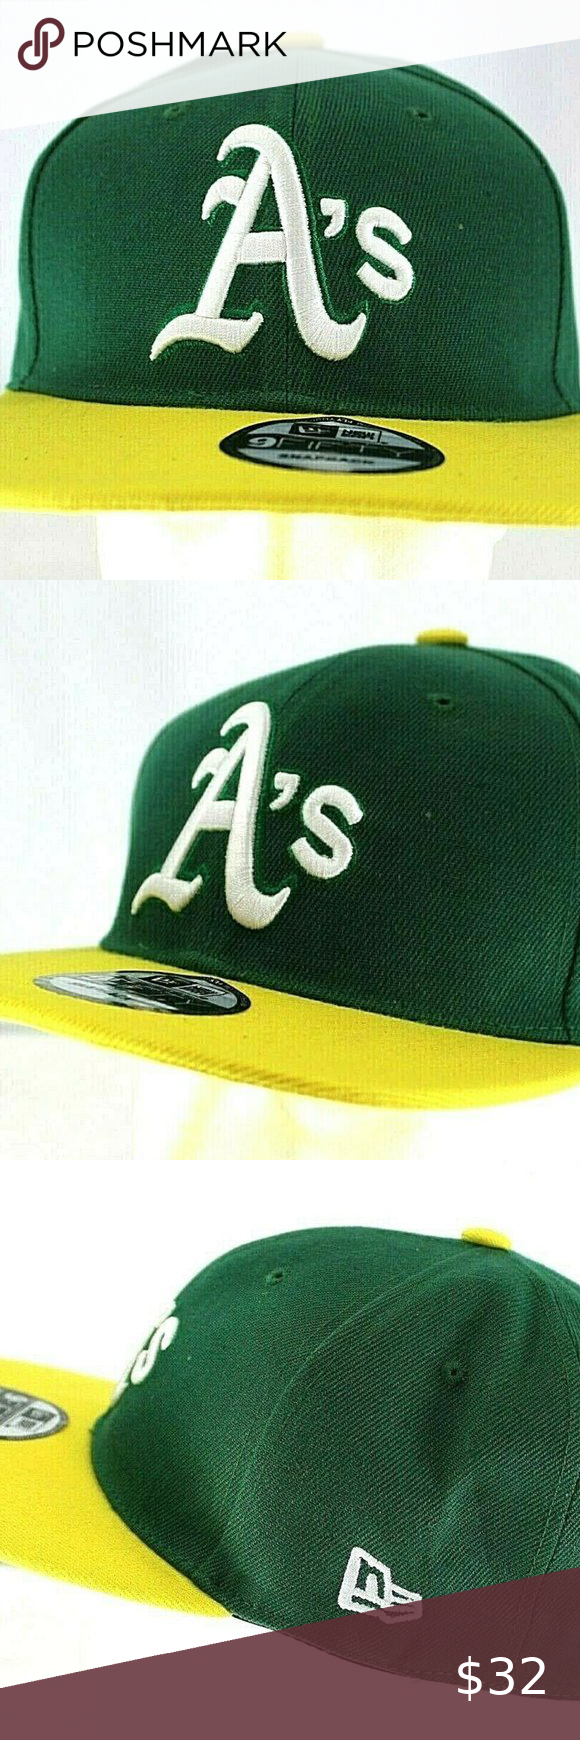 Oakland Athletics Green Yellow Mlb Baseball Cap In 2020 Mlb Baseball Caps Mlb Baseball Oakland Athletics